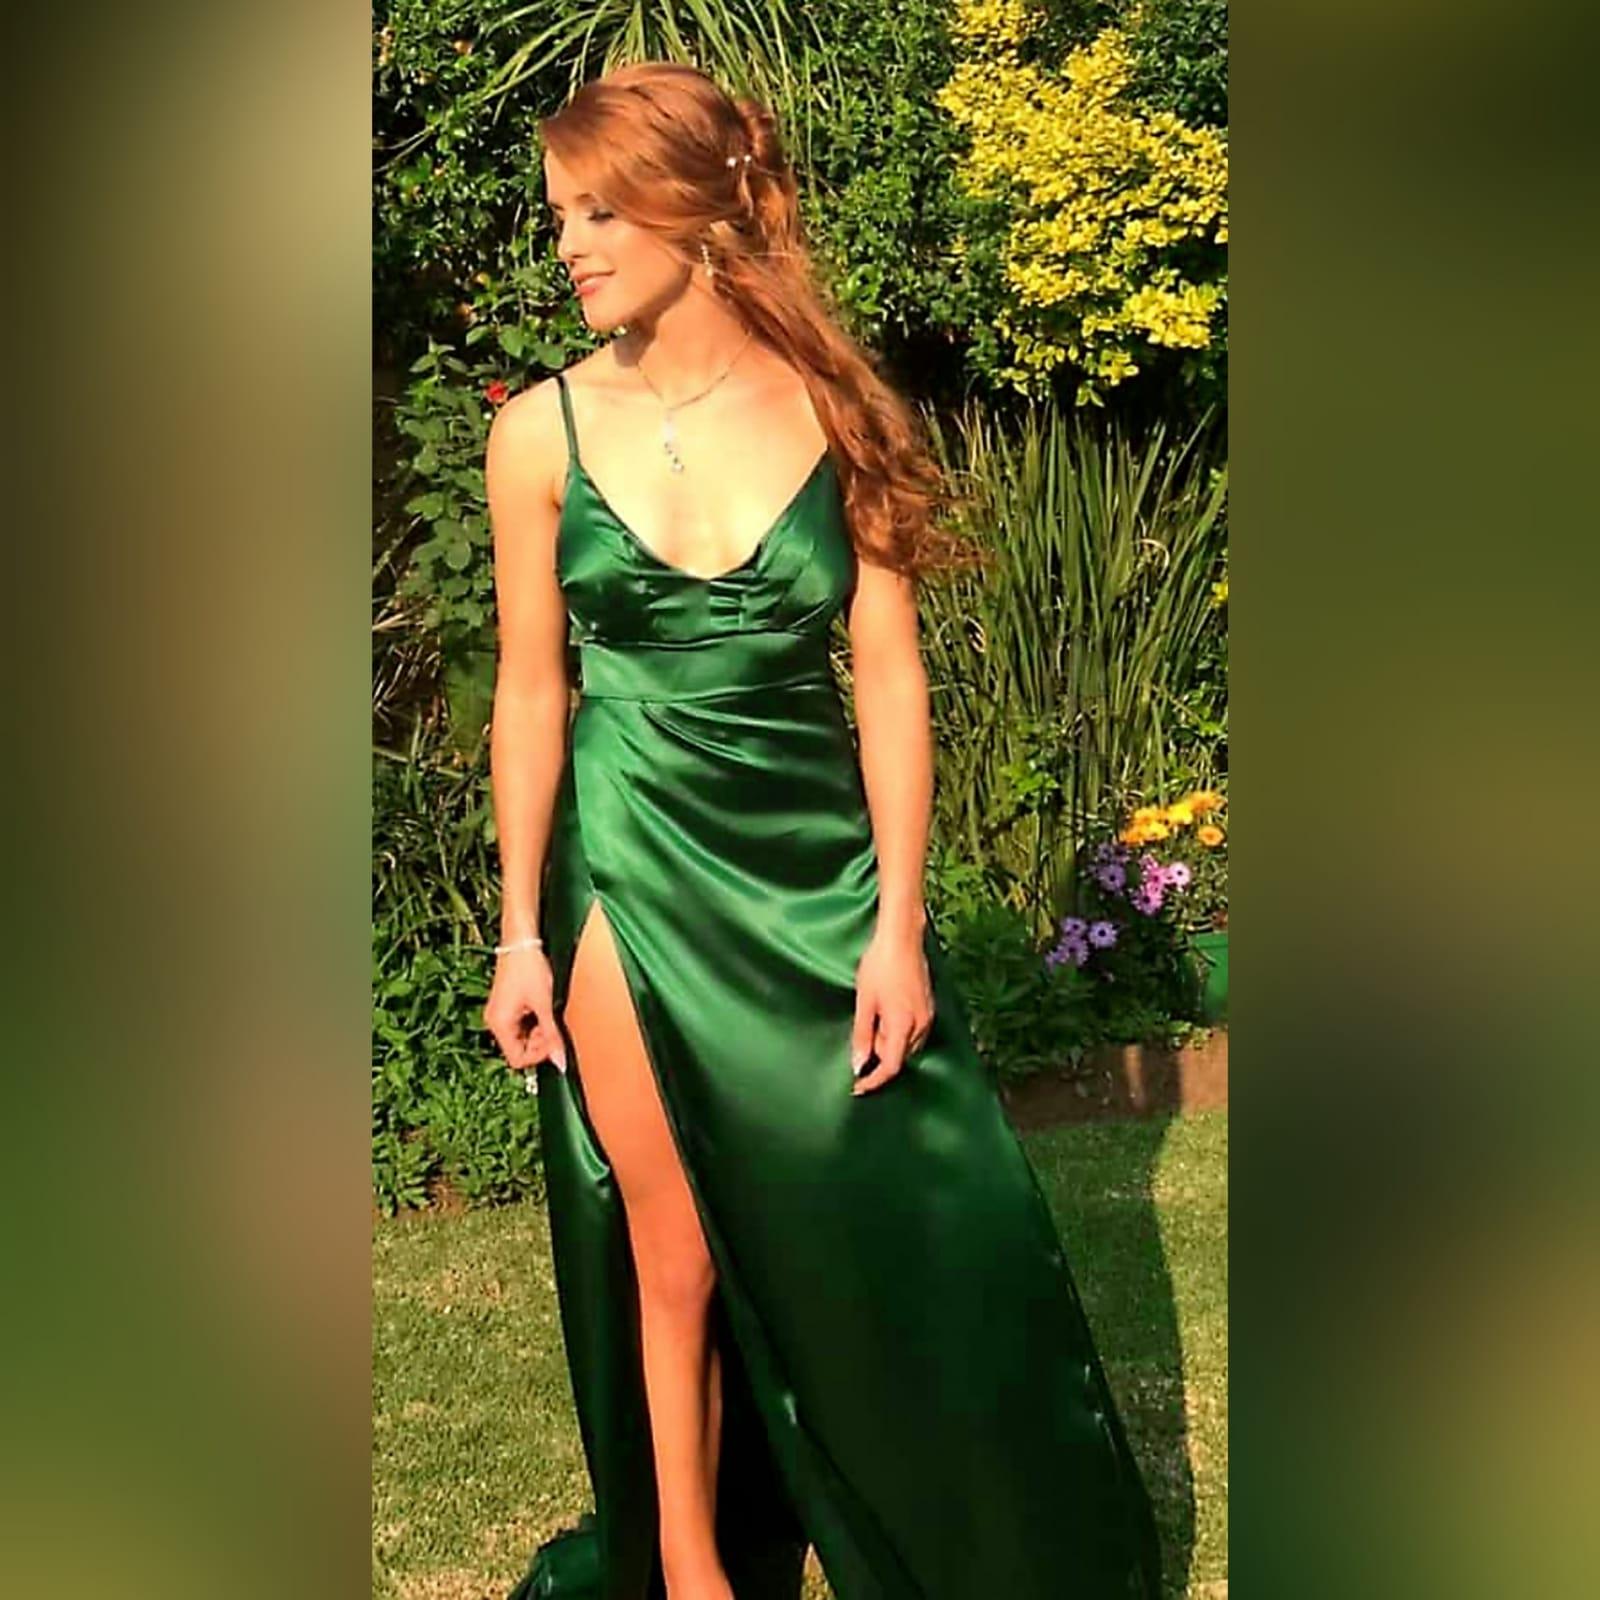 Emerald green long satin prom dress 1 emerald green long satin prom dress. With a high crossed slit and a train.